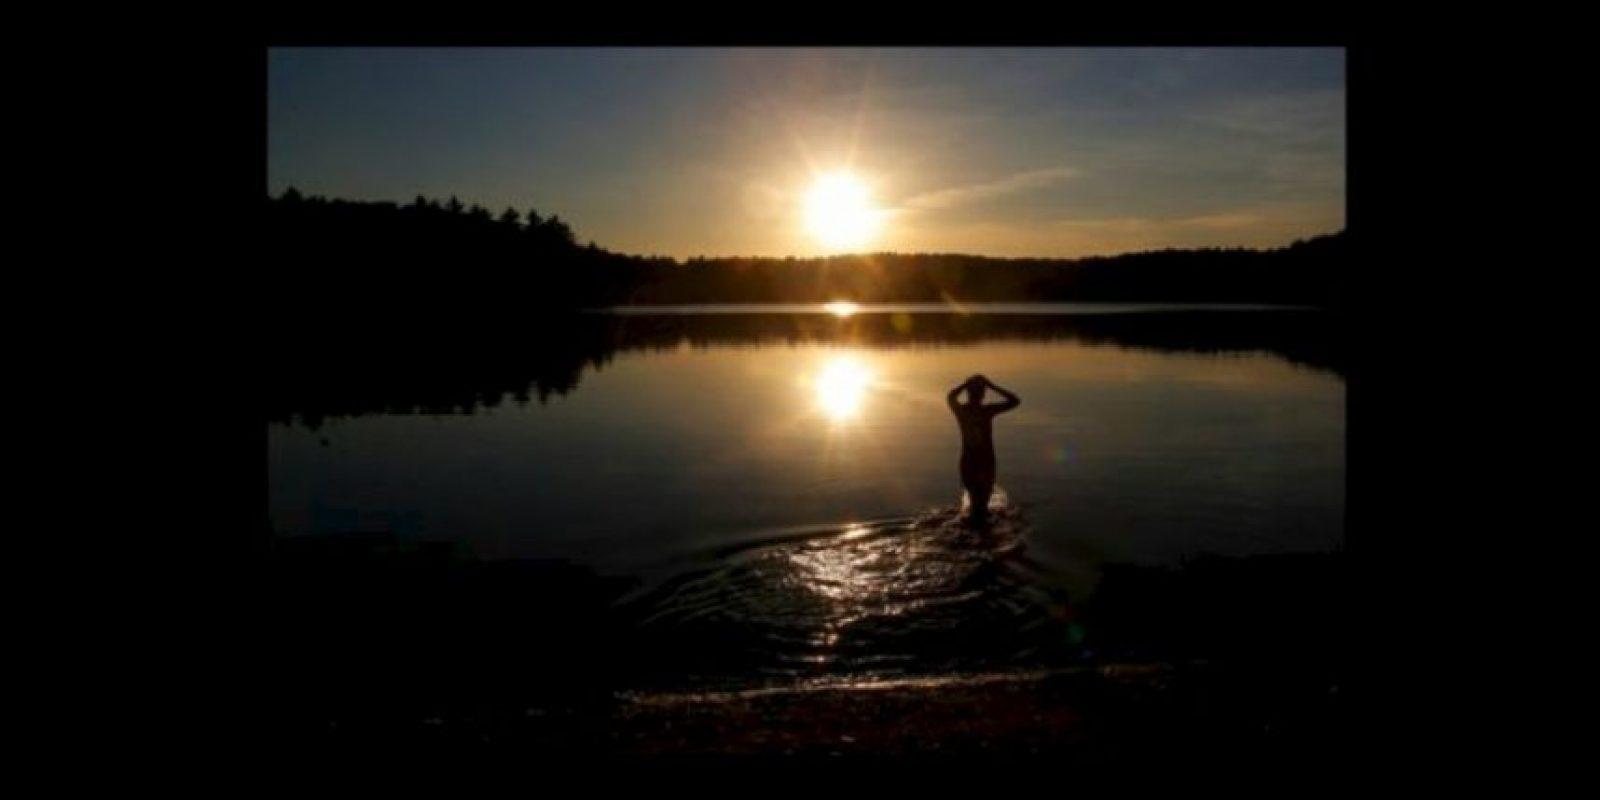 12- Mirar un paisaje. Admirar la naturaleza incrementa la memoria en un 20%. Foto:Vía Tumblr.com